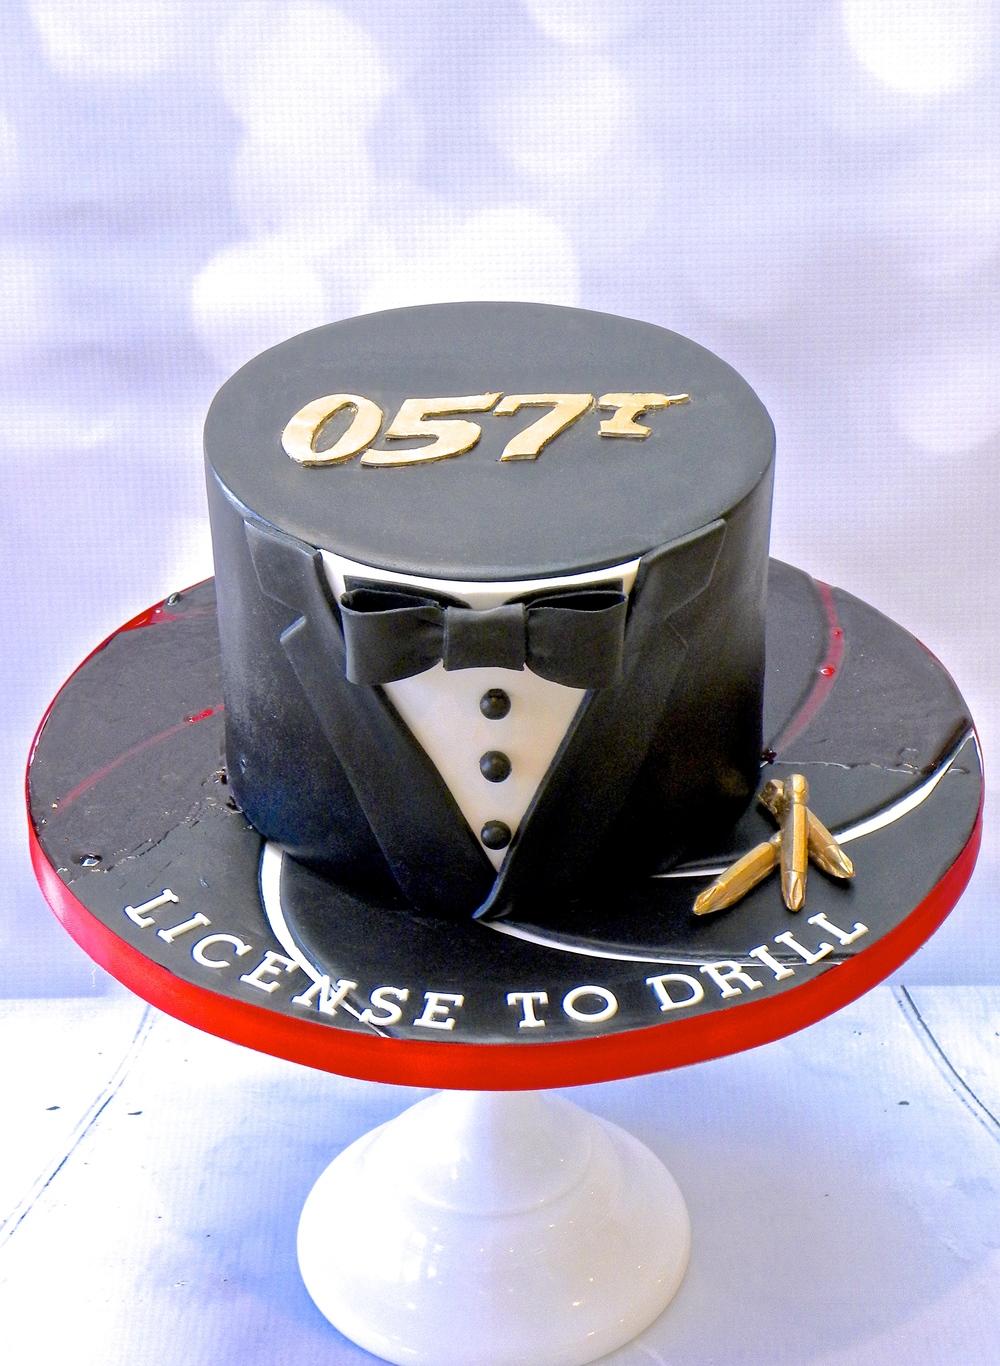 James Bond themed cake for a DIY enthusiast